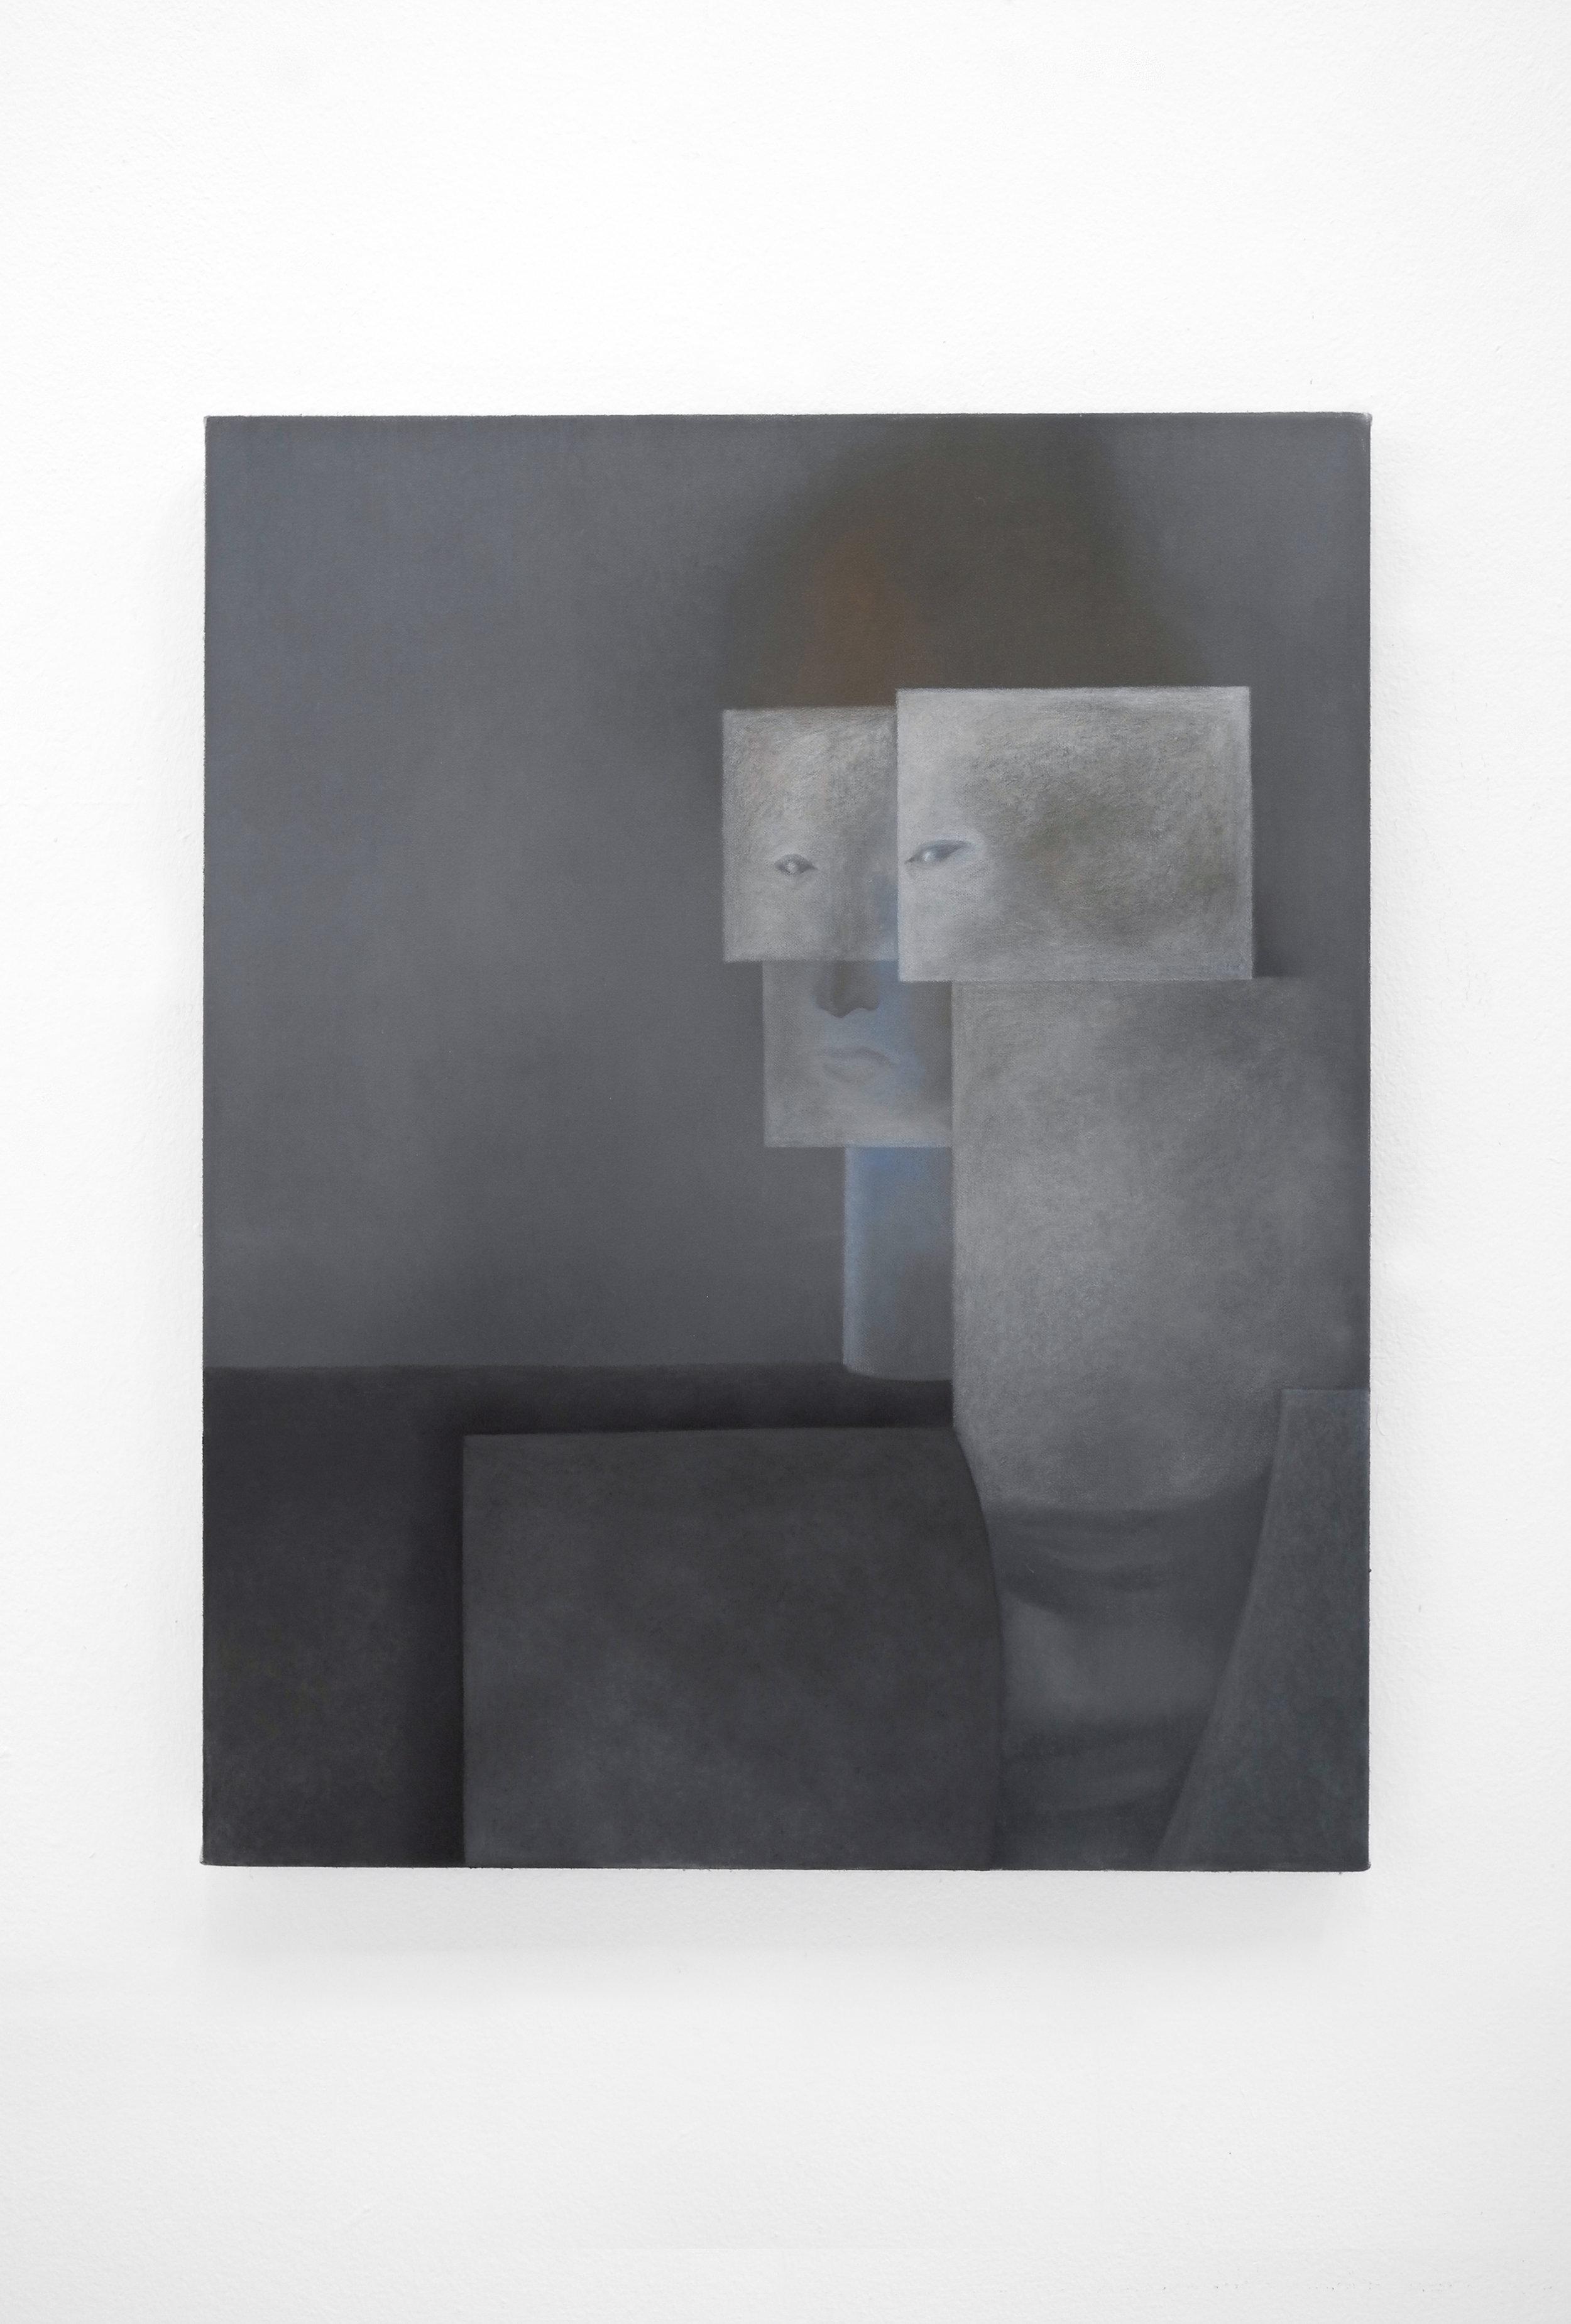 Sonya Derviz, 'Two jackets', oil on canvas, 50x40cm, 2018-19.jpg